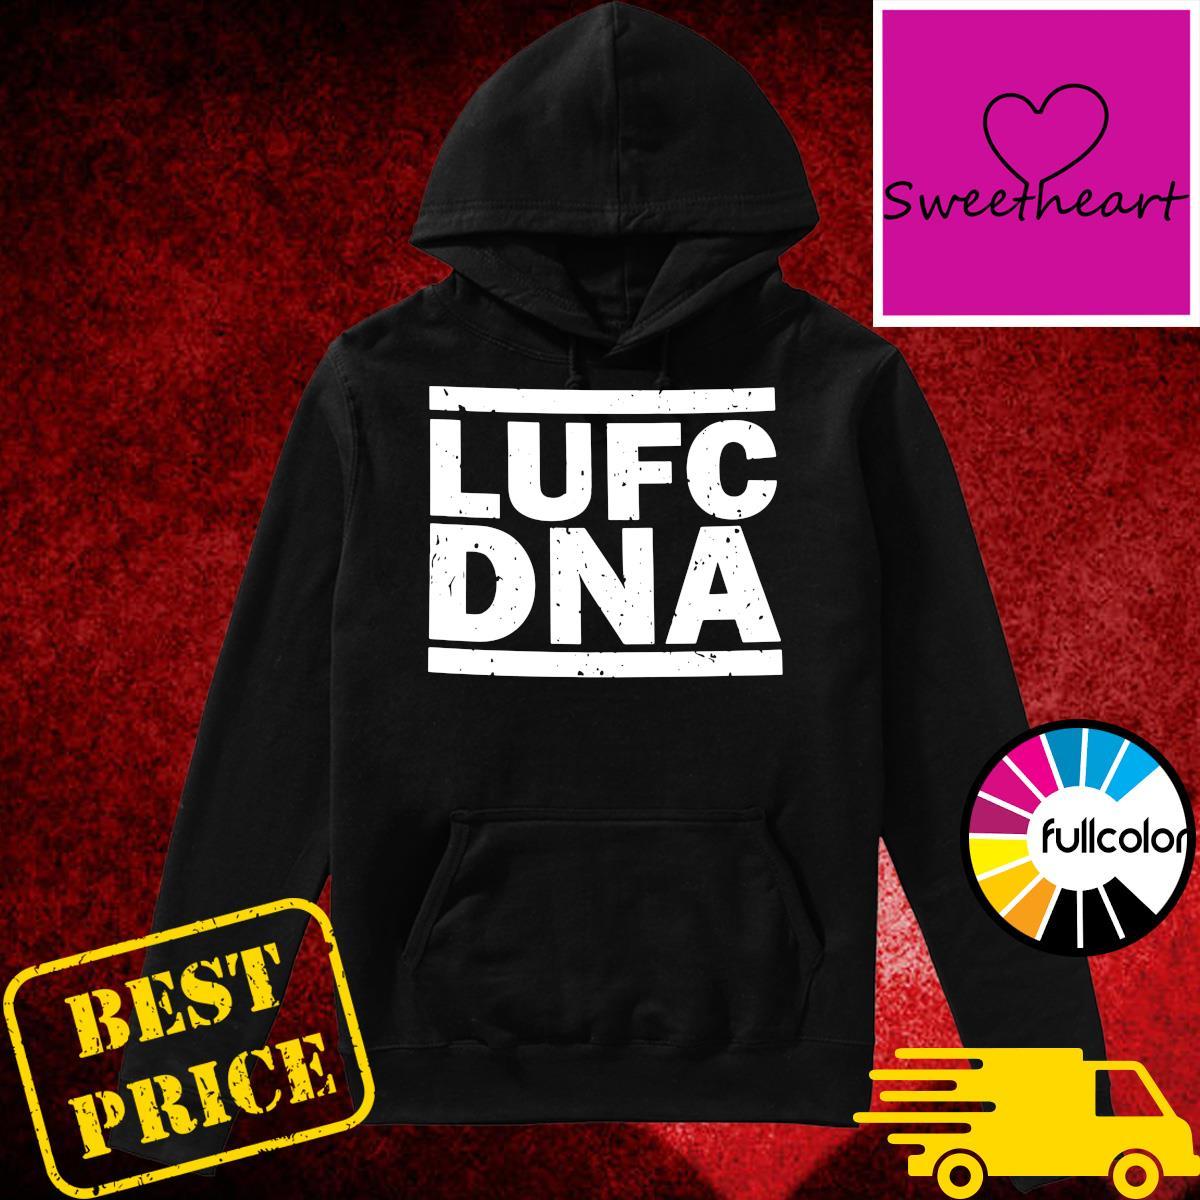 official LUFC DNA Hoodie